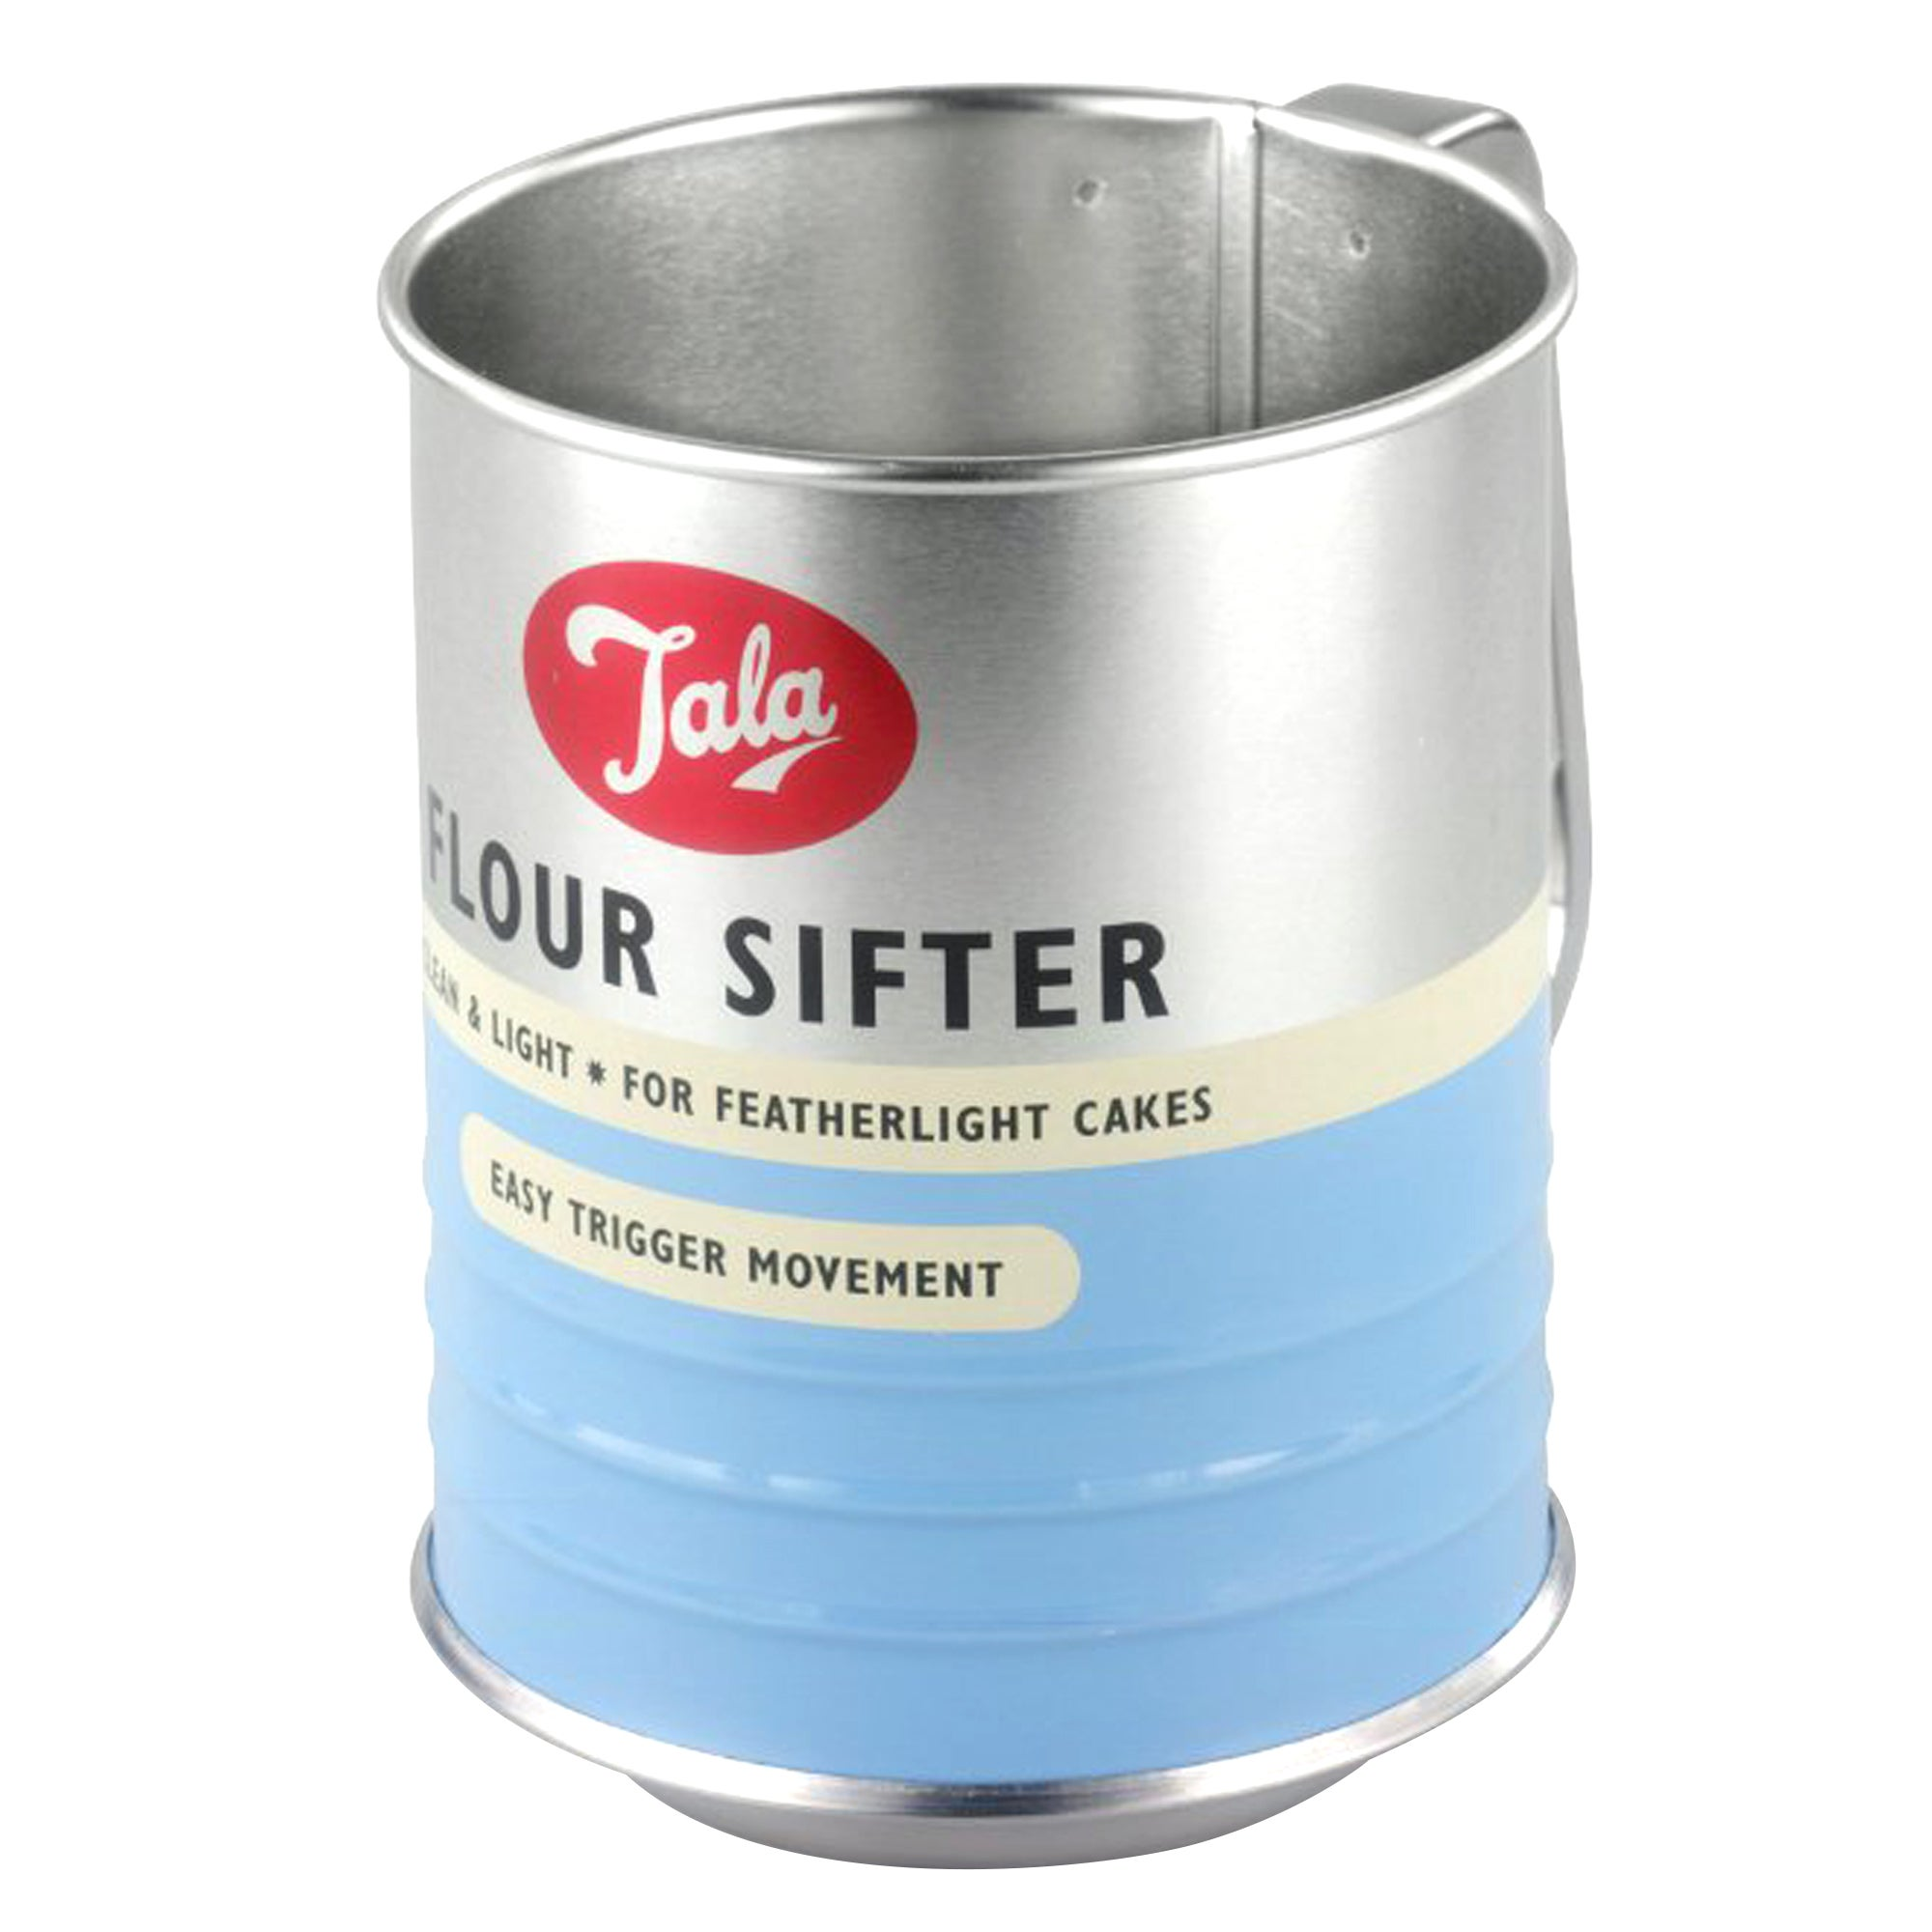 Tala Retro Flour Sifter